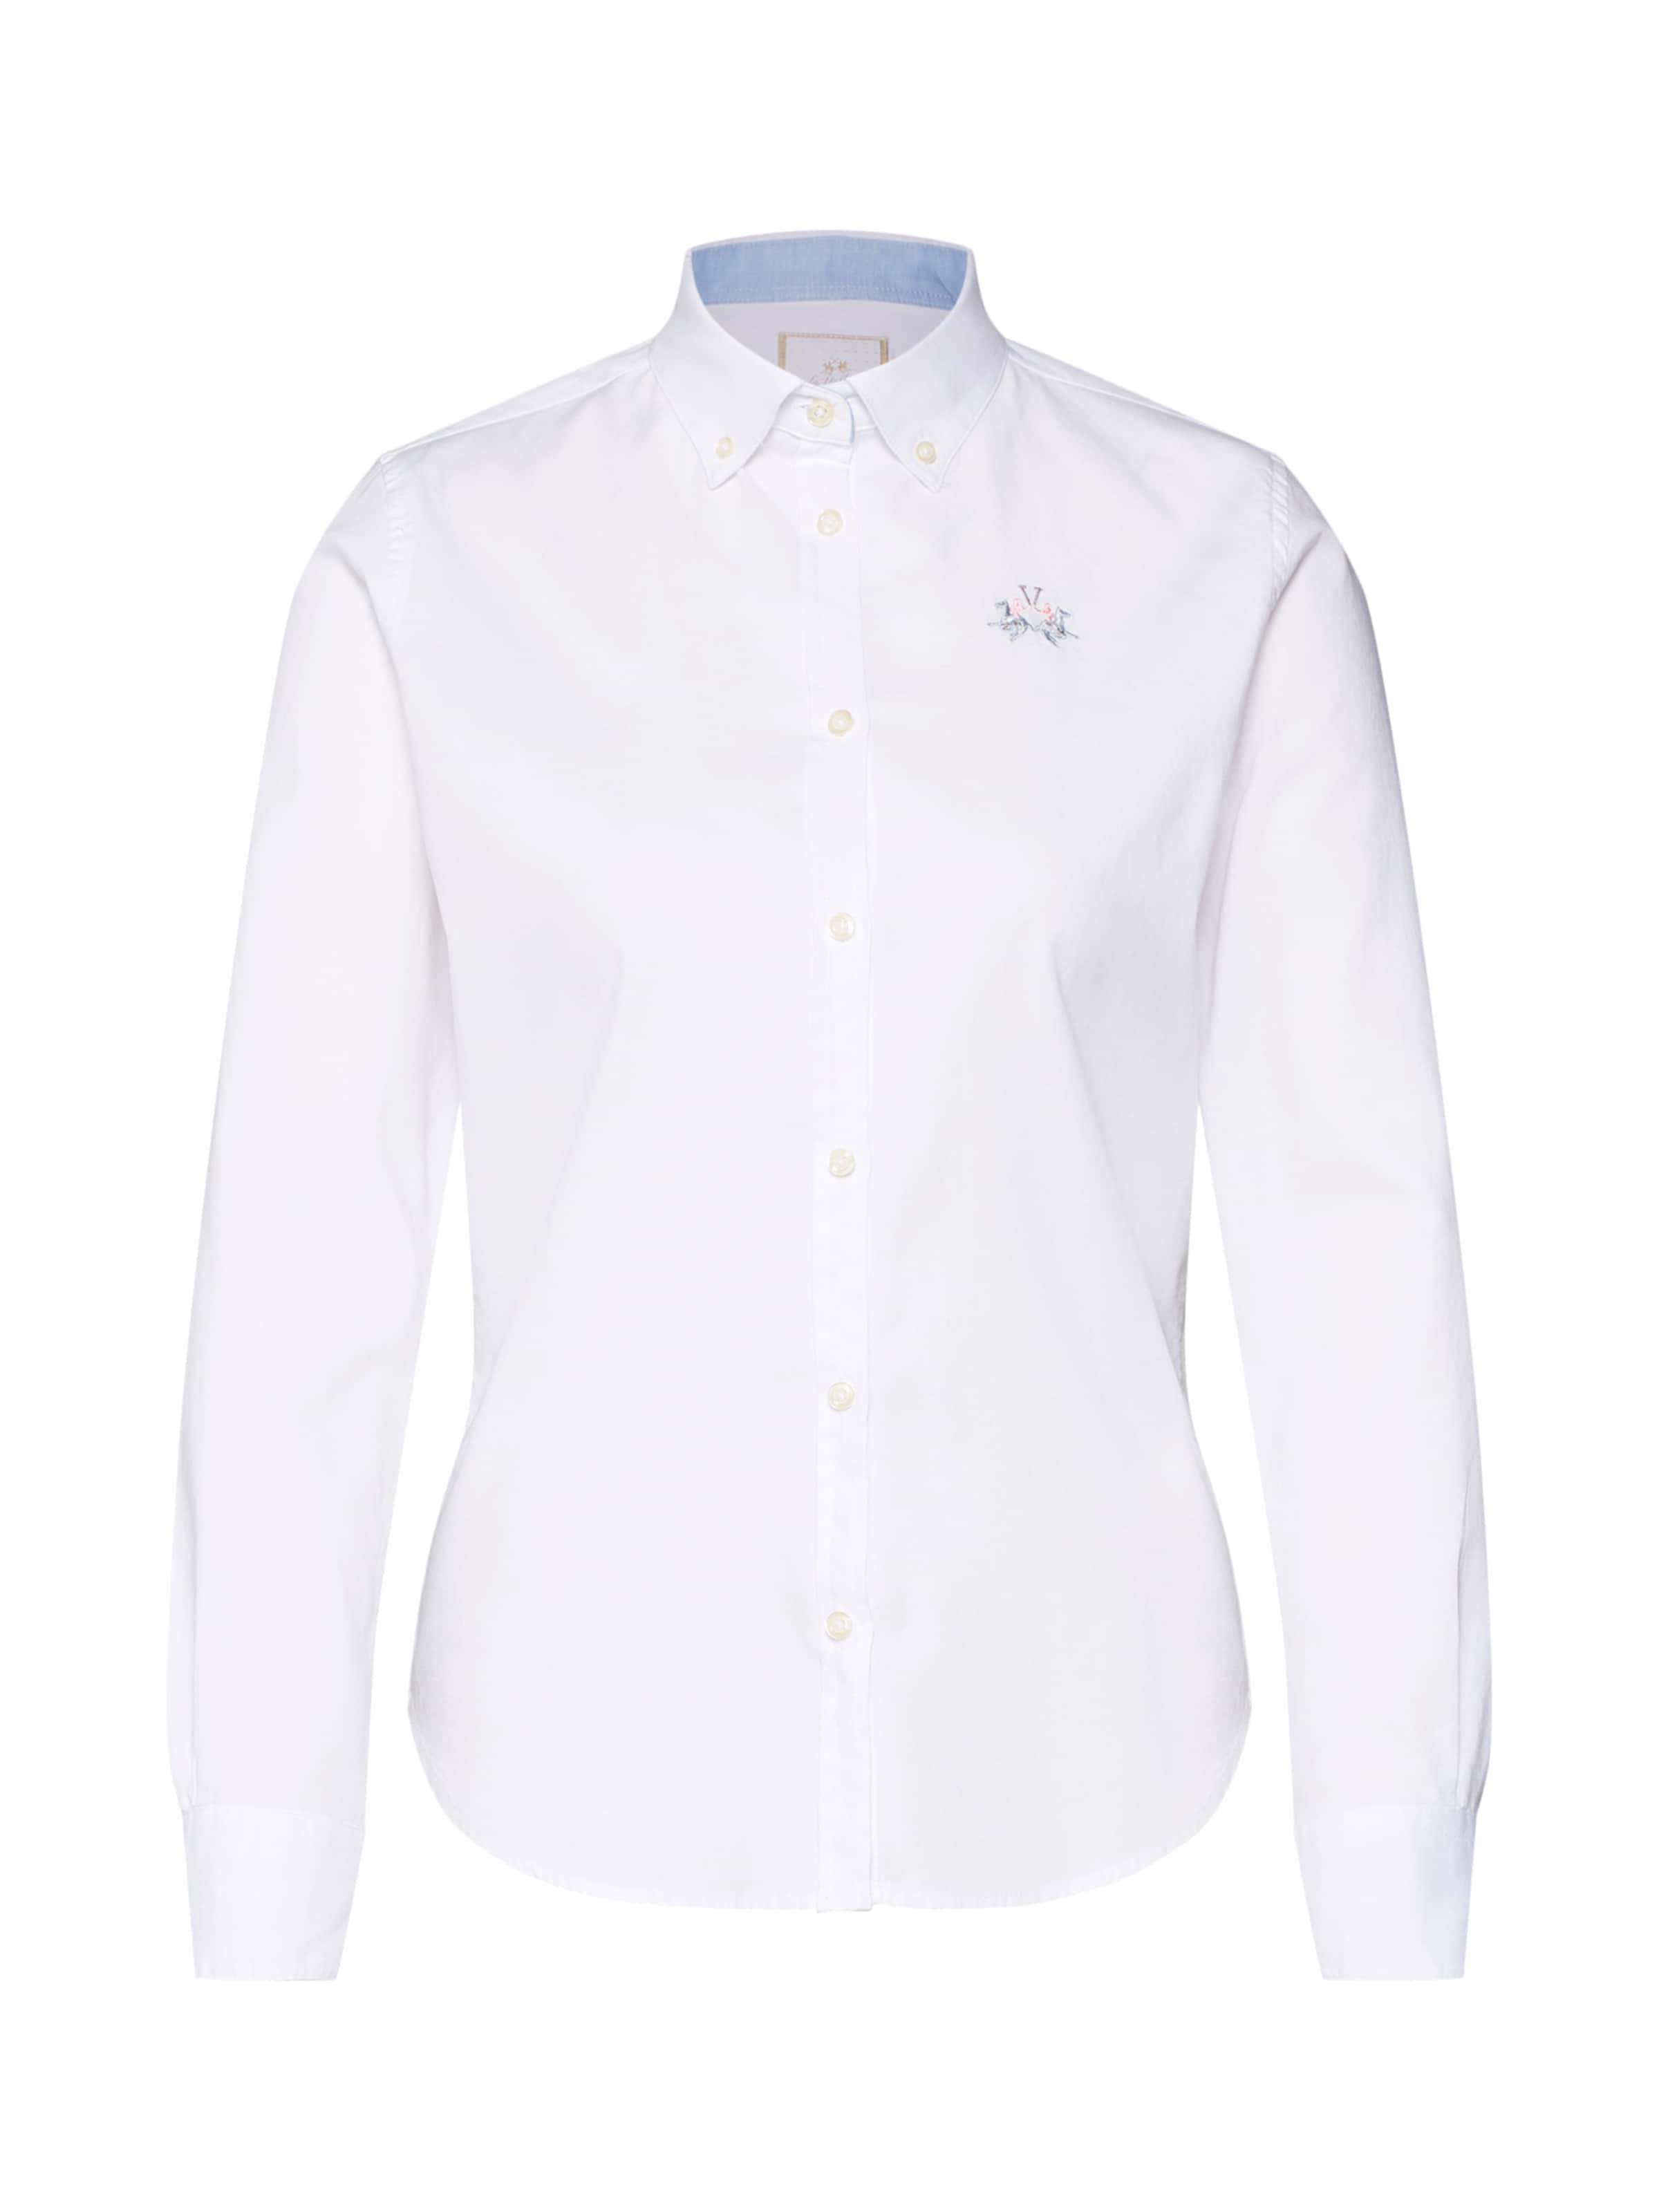 'shirt L En Oxford Chemisier Clair s 1 Bleu 50 Str' Martina 30 La 2 PTkZOiXu